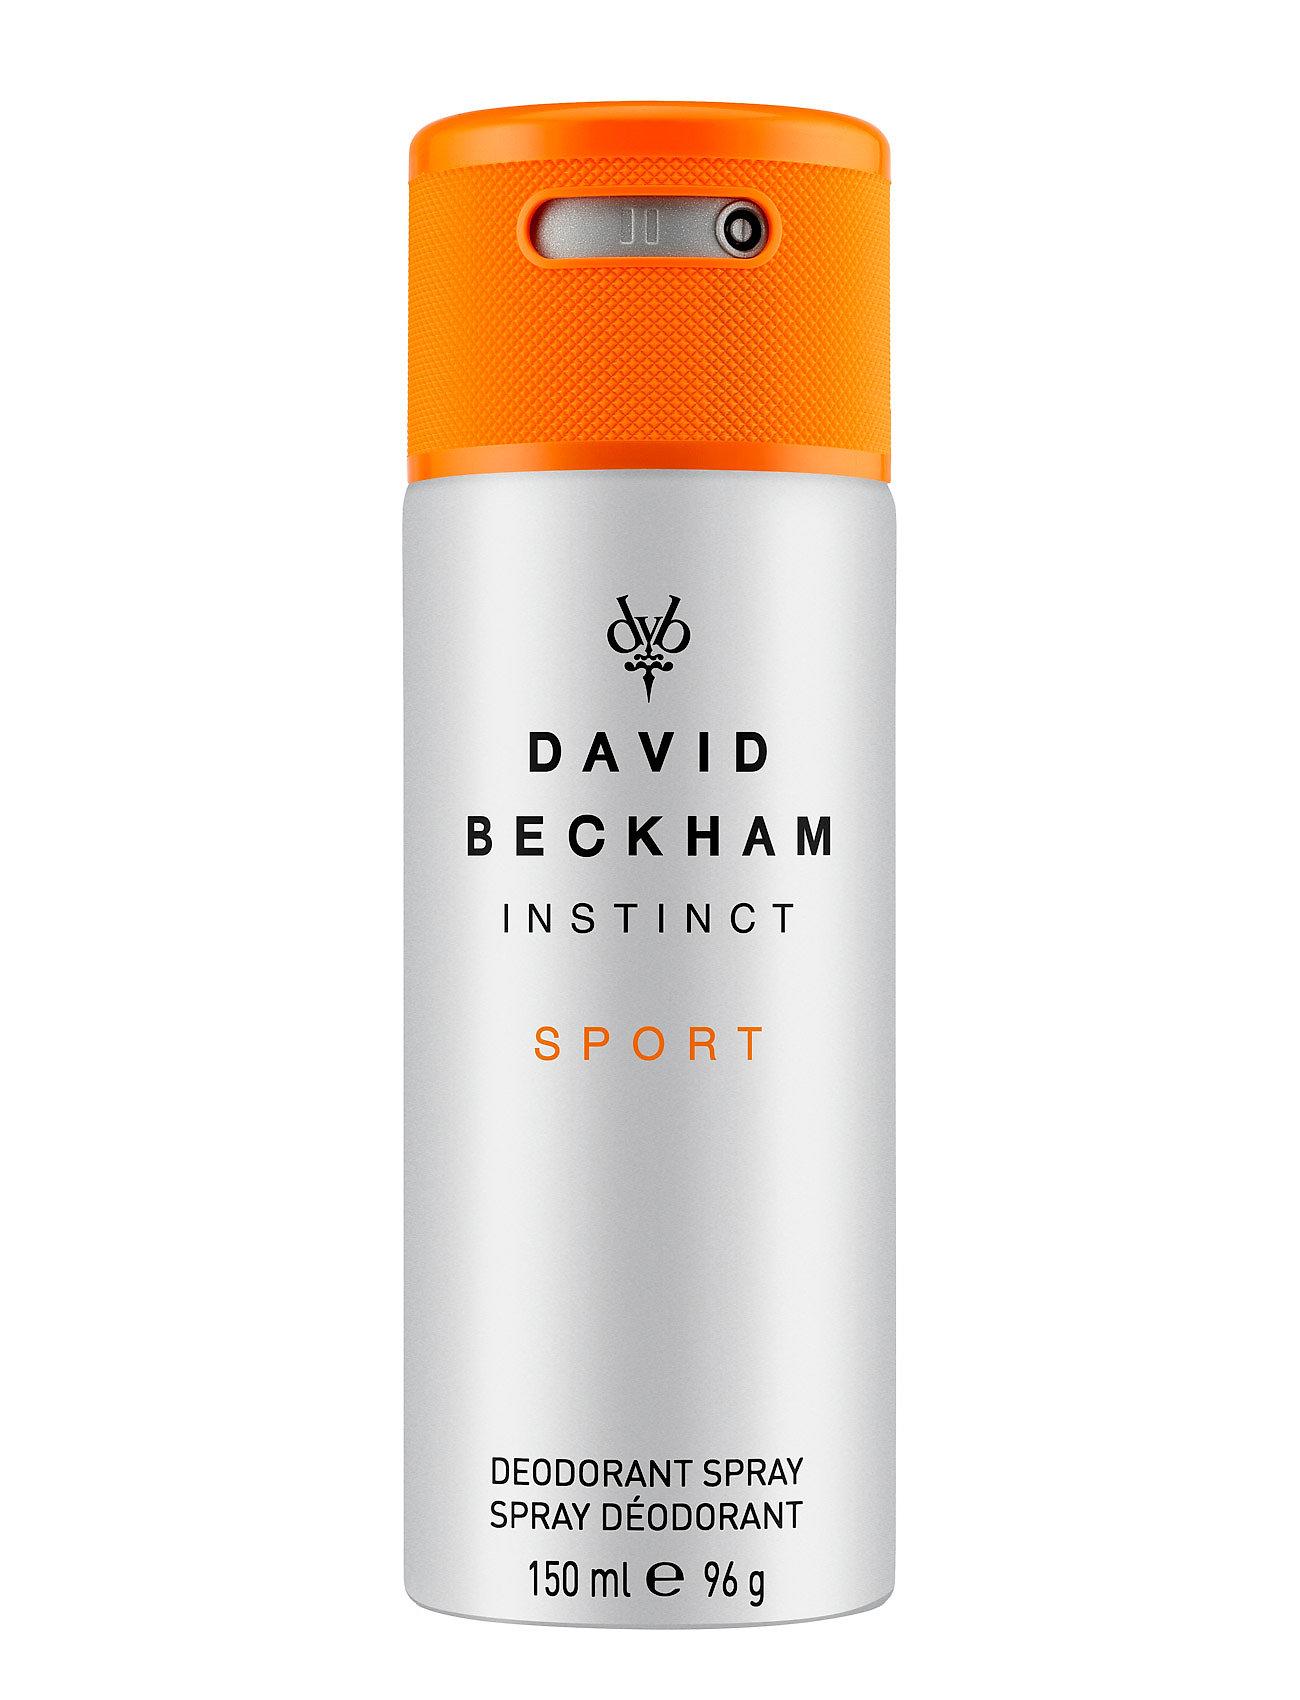 david beckham Dvb instinct sport b/s 150ml fra boozt.com dk